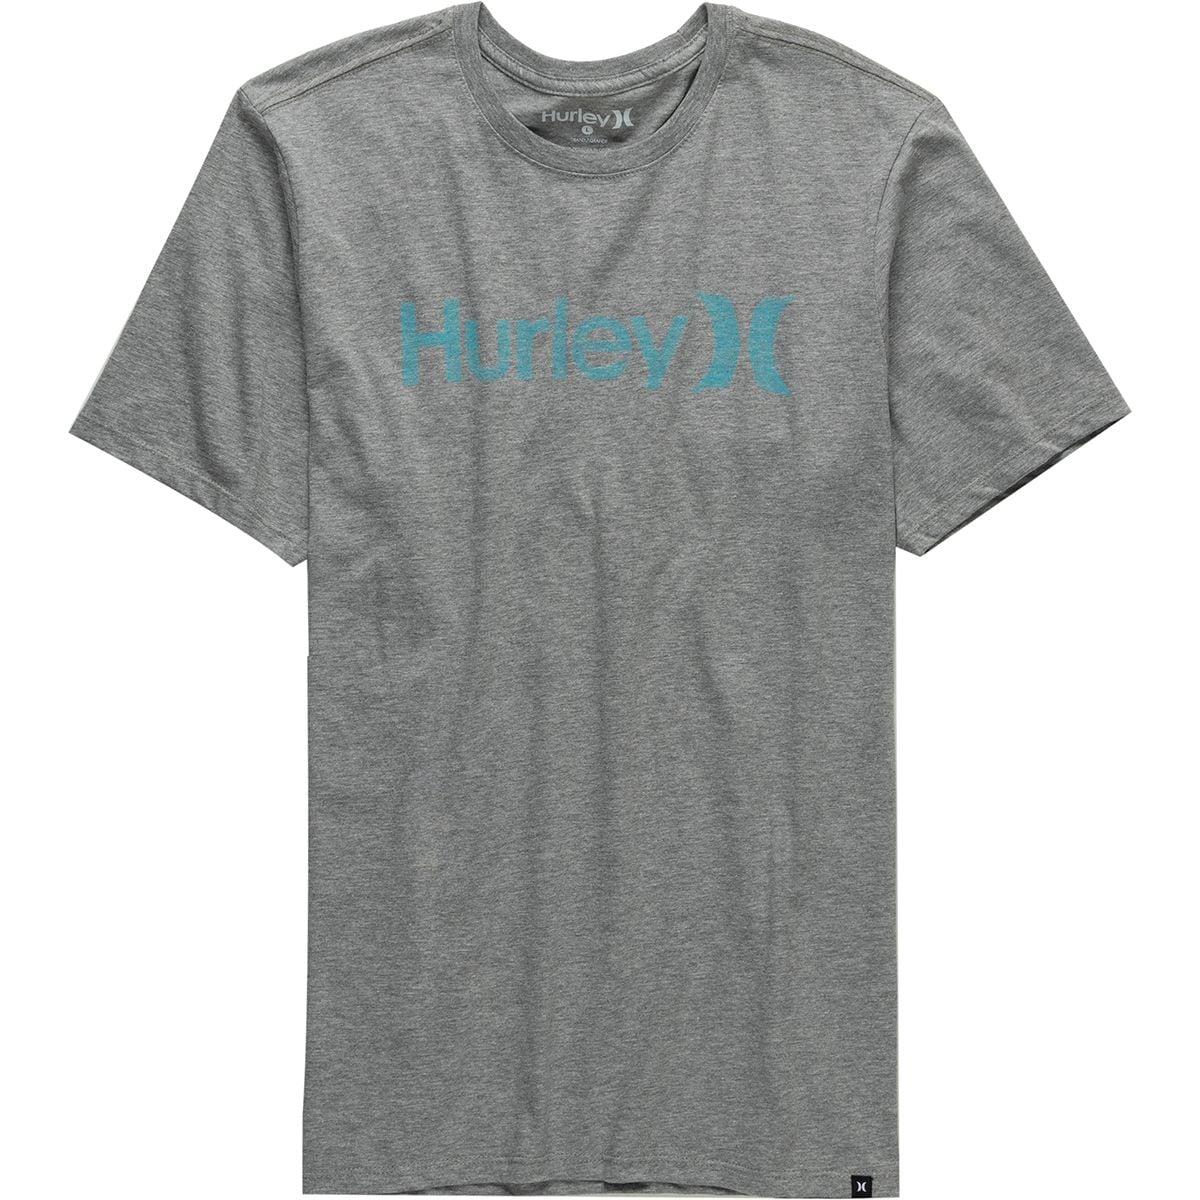 One & Only Push Through Short-Sleeve T-Shirt - Men